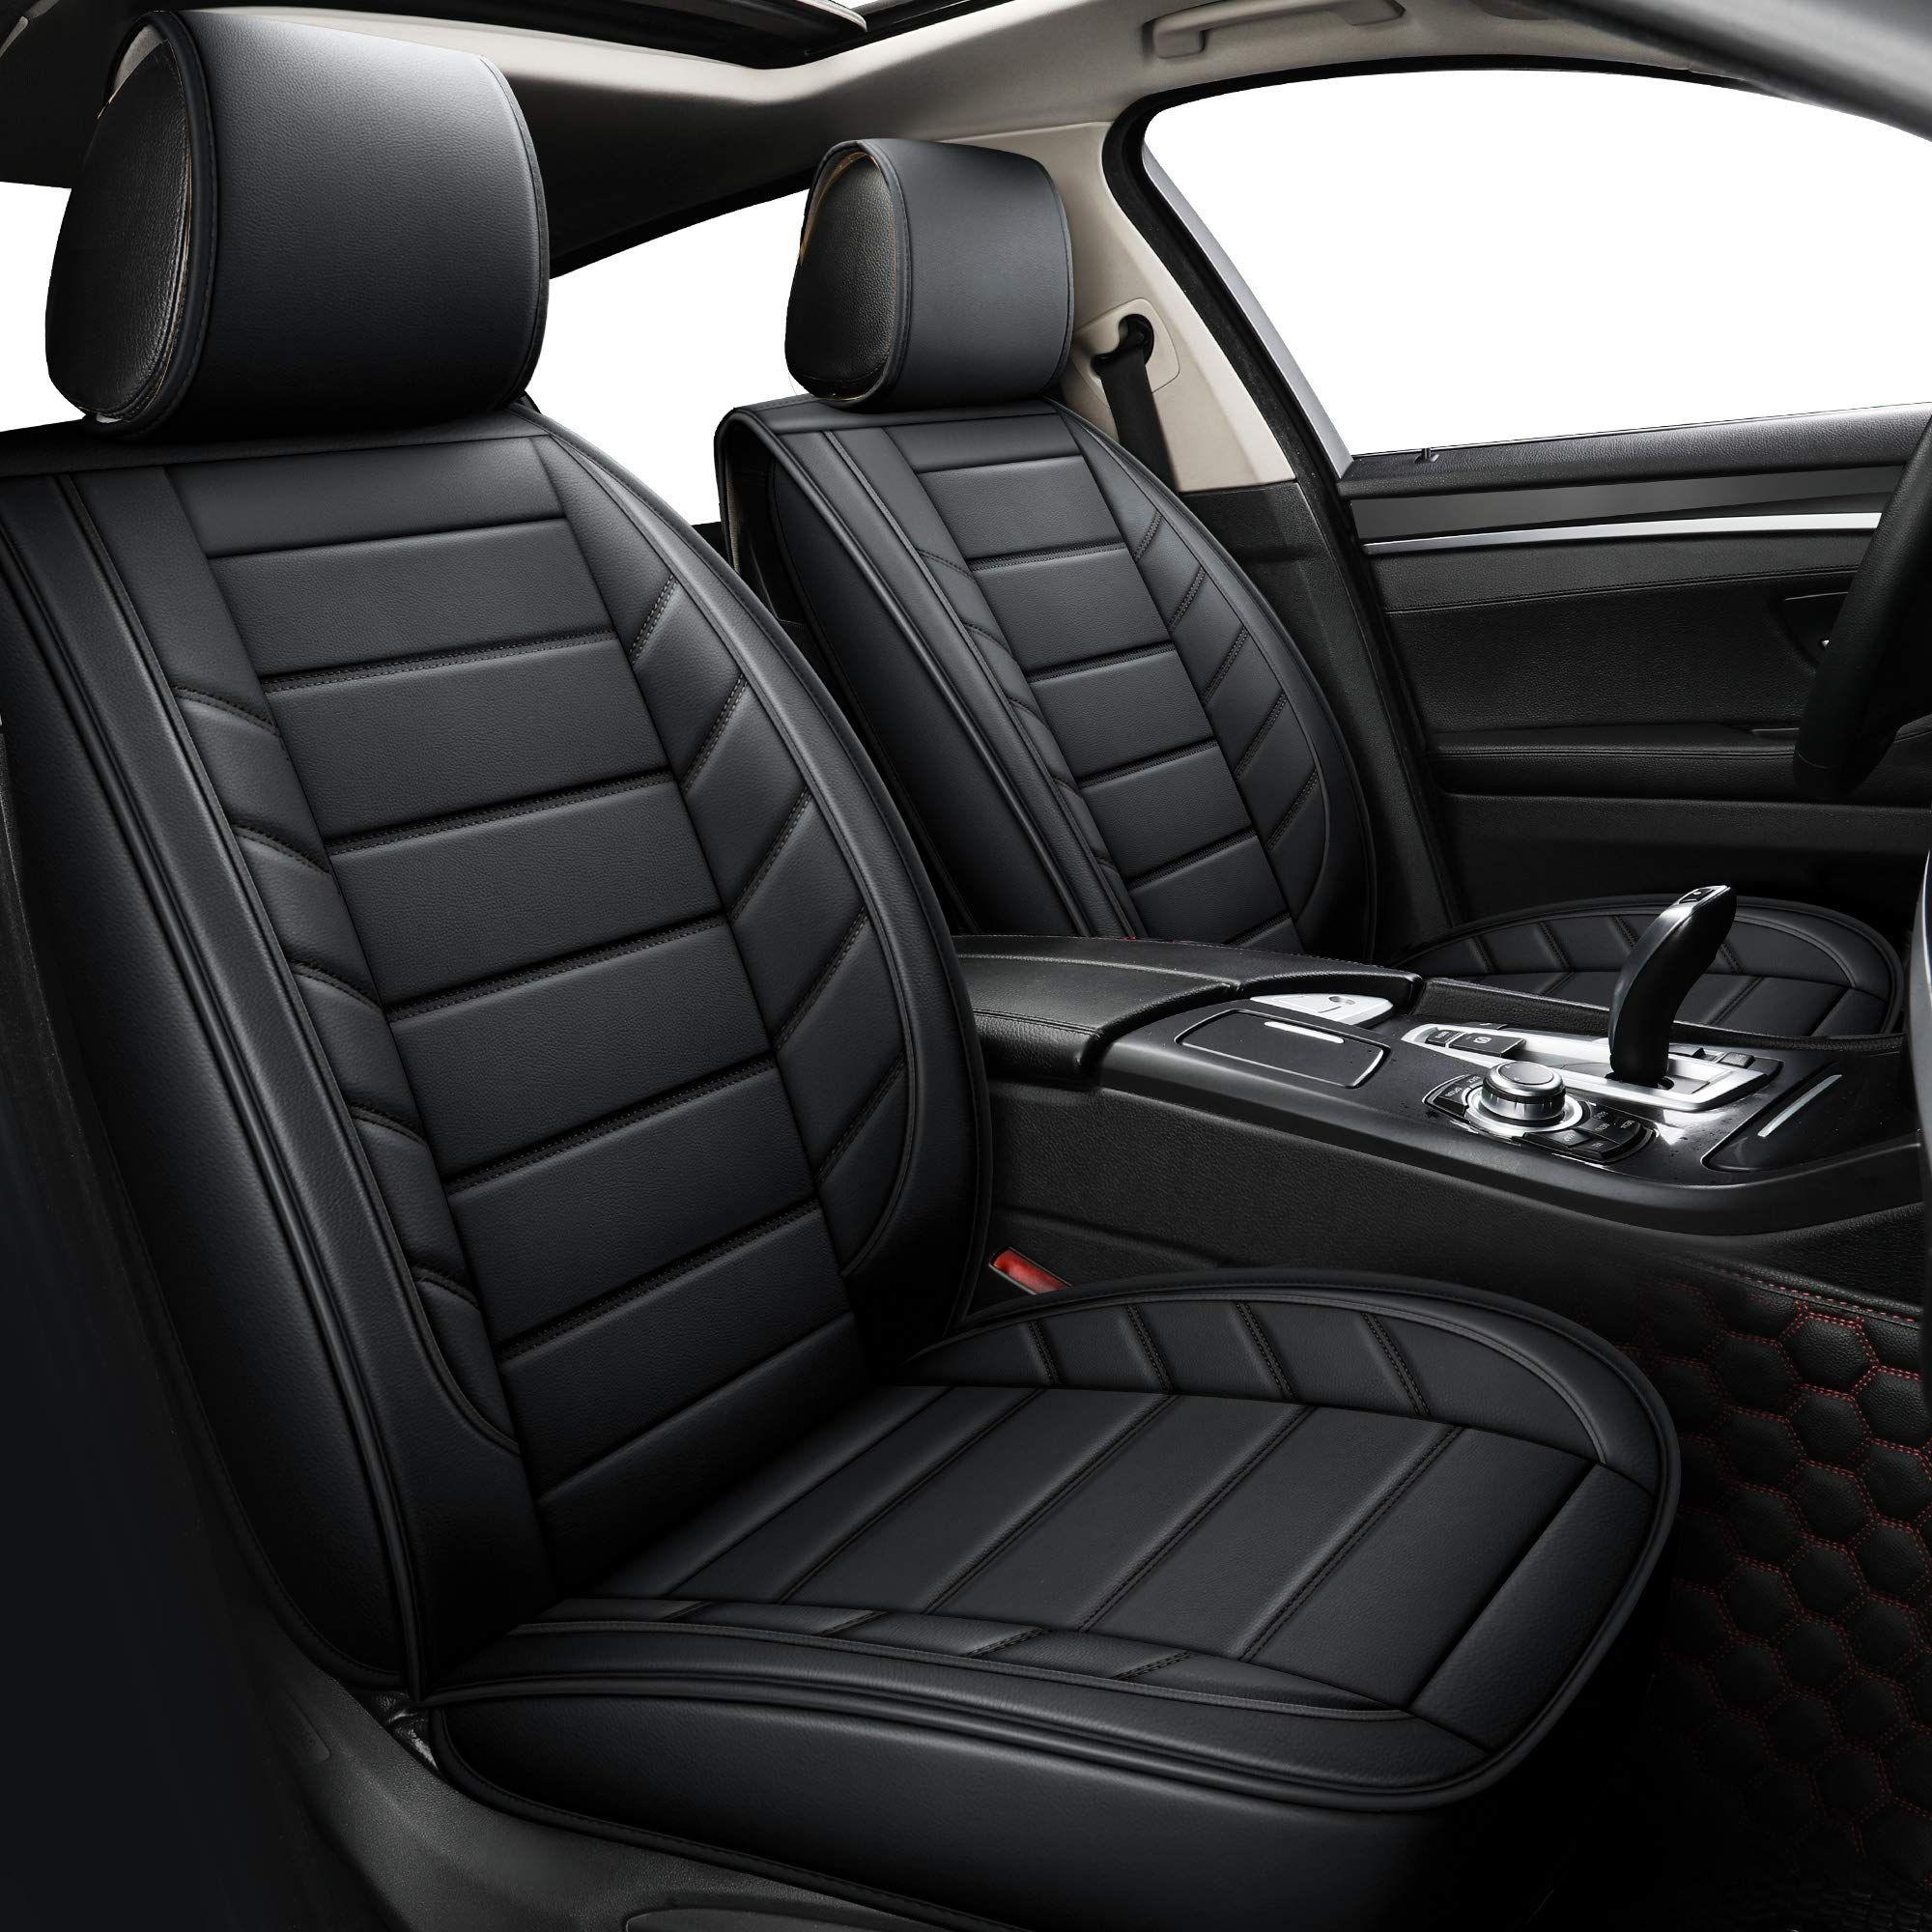 Luckyman Club Car Seat Covers Fi Chevy Cruze Nissan Altima Car